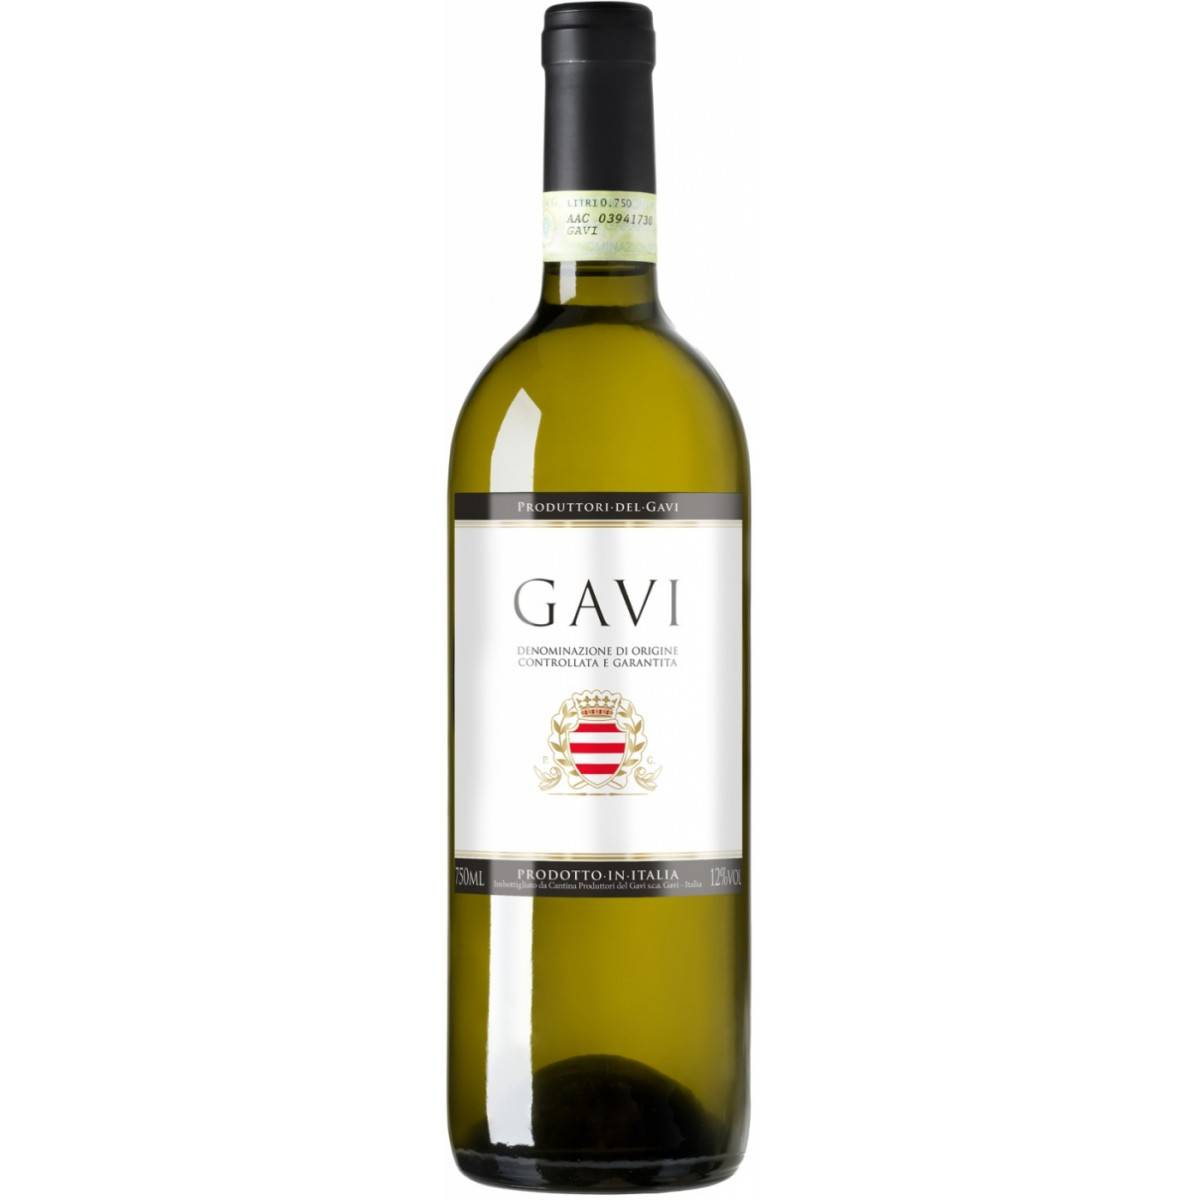 Гави вино: характеристики, классификация, производители